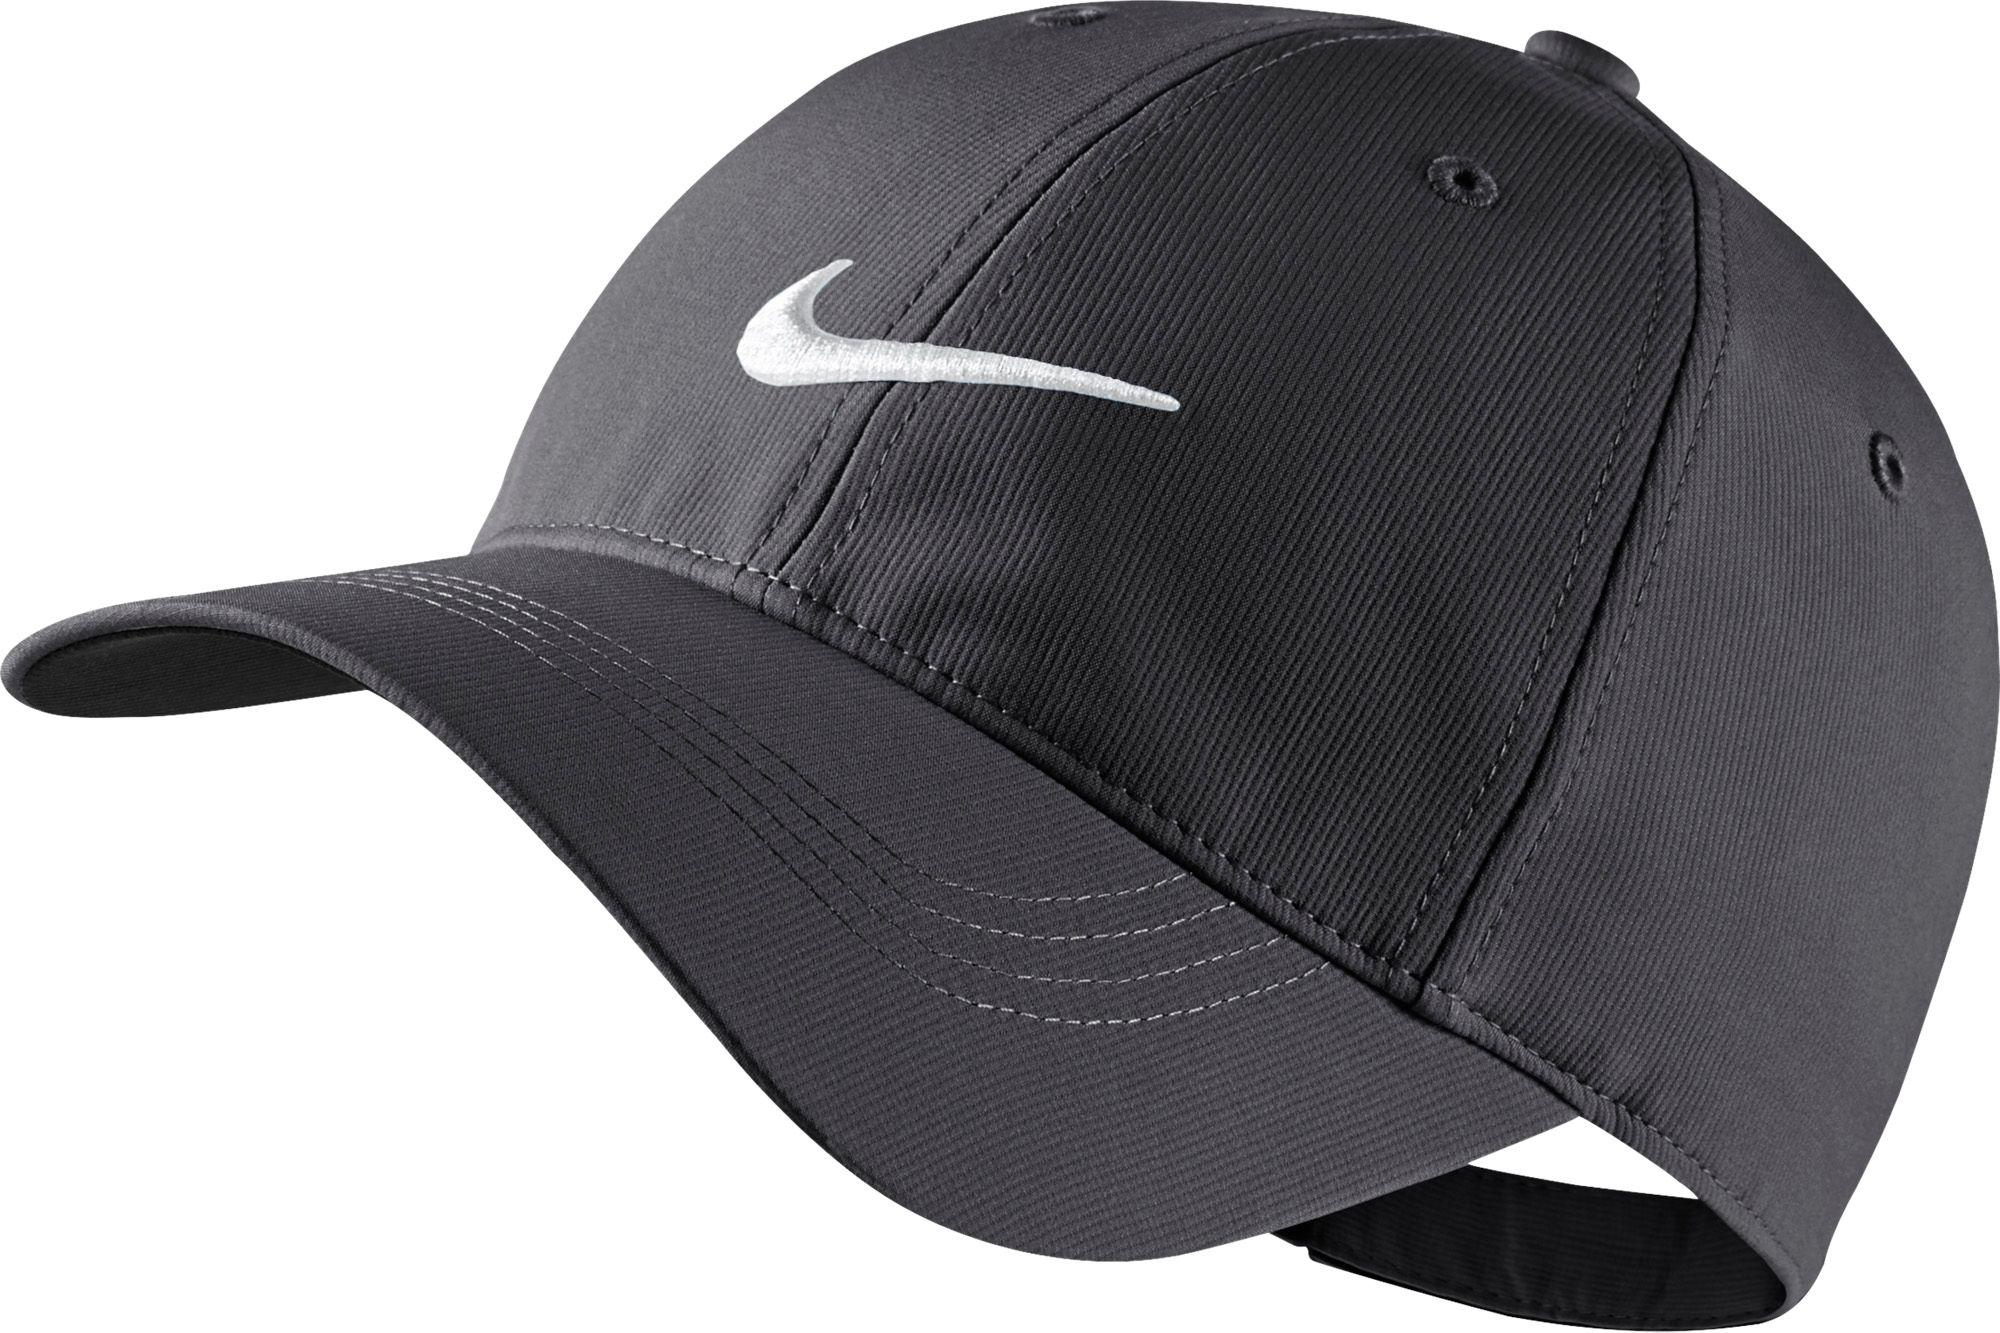 Lyst - Nike Legacy91 Tech Golf Hat in Gray for Men f65682f6e029